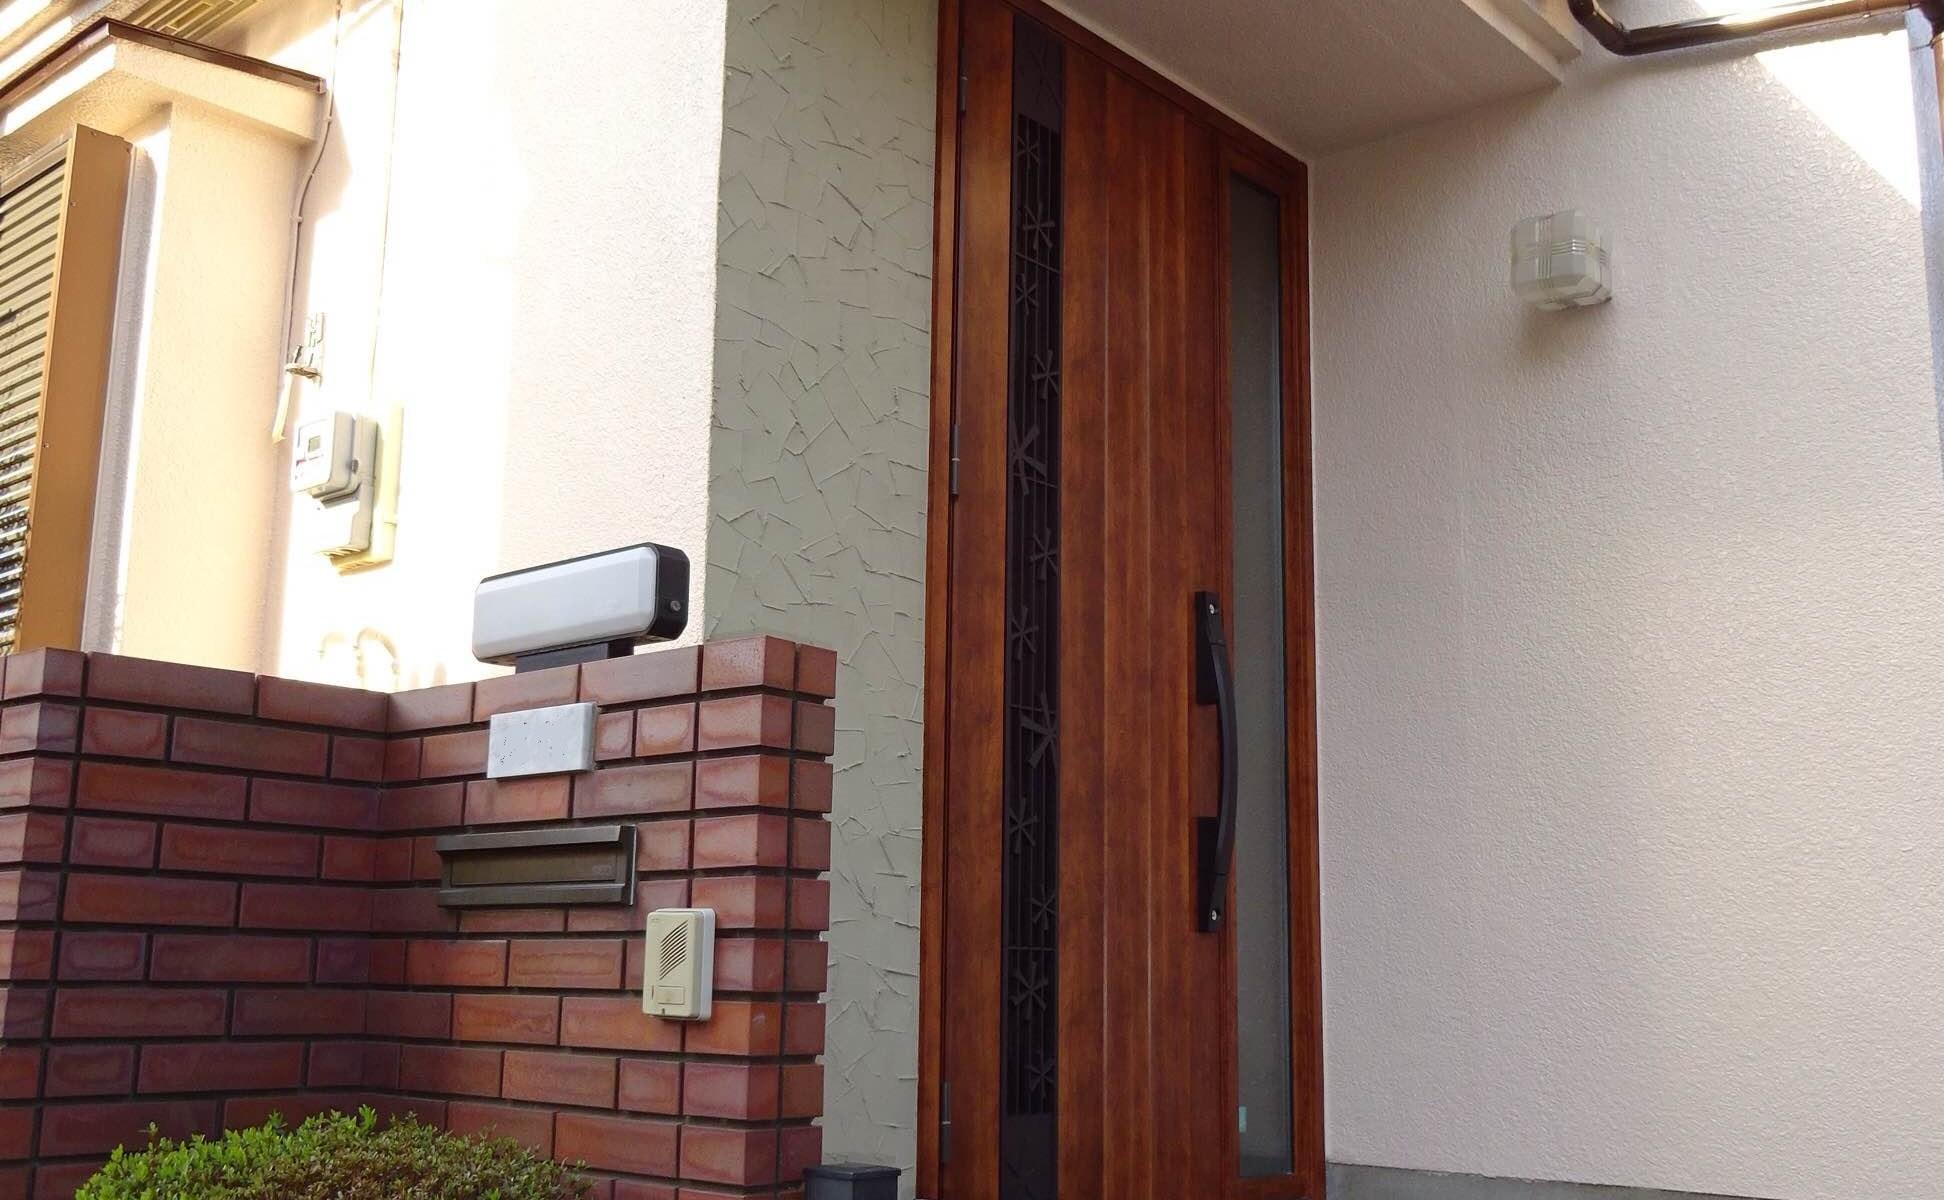 LIXIL玄関ドア施工事例